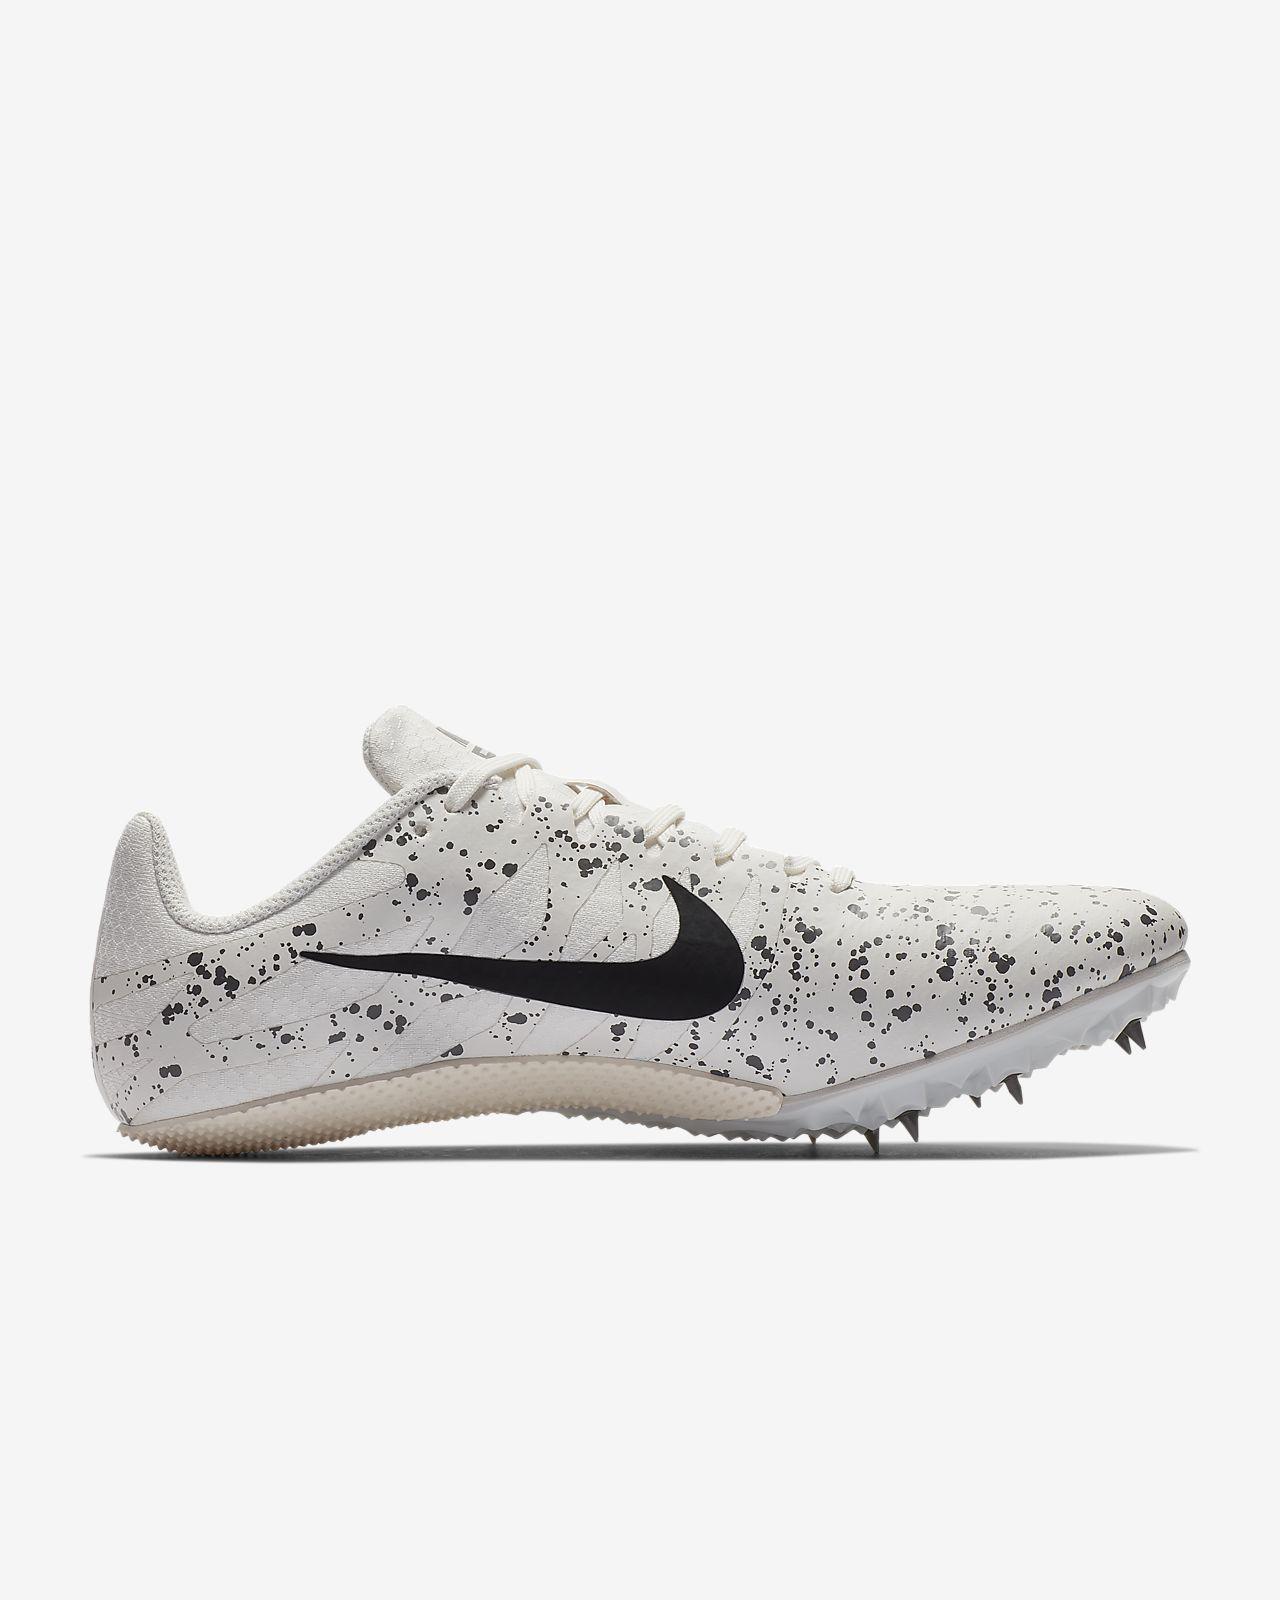 48a8eb6abe5 Unisex παπούτσι στίβου Nike Zoom Rival S 9. Nike.com GR